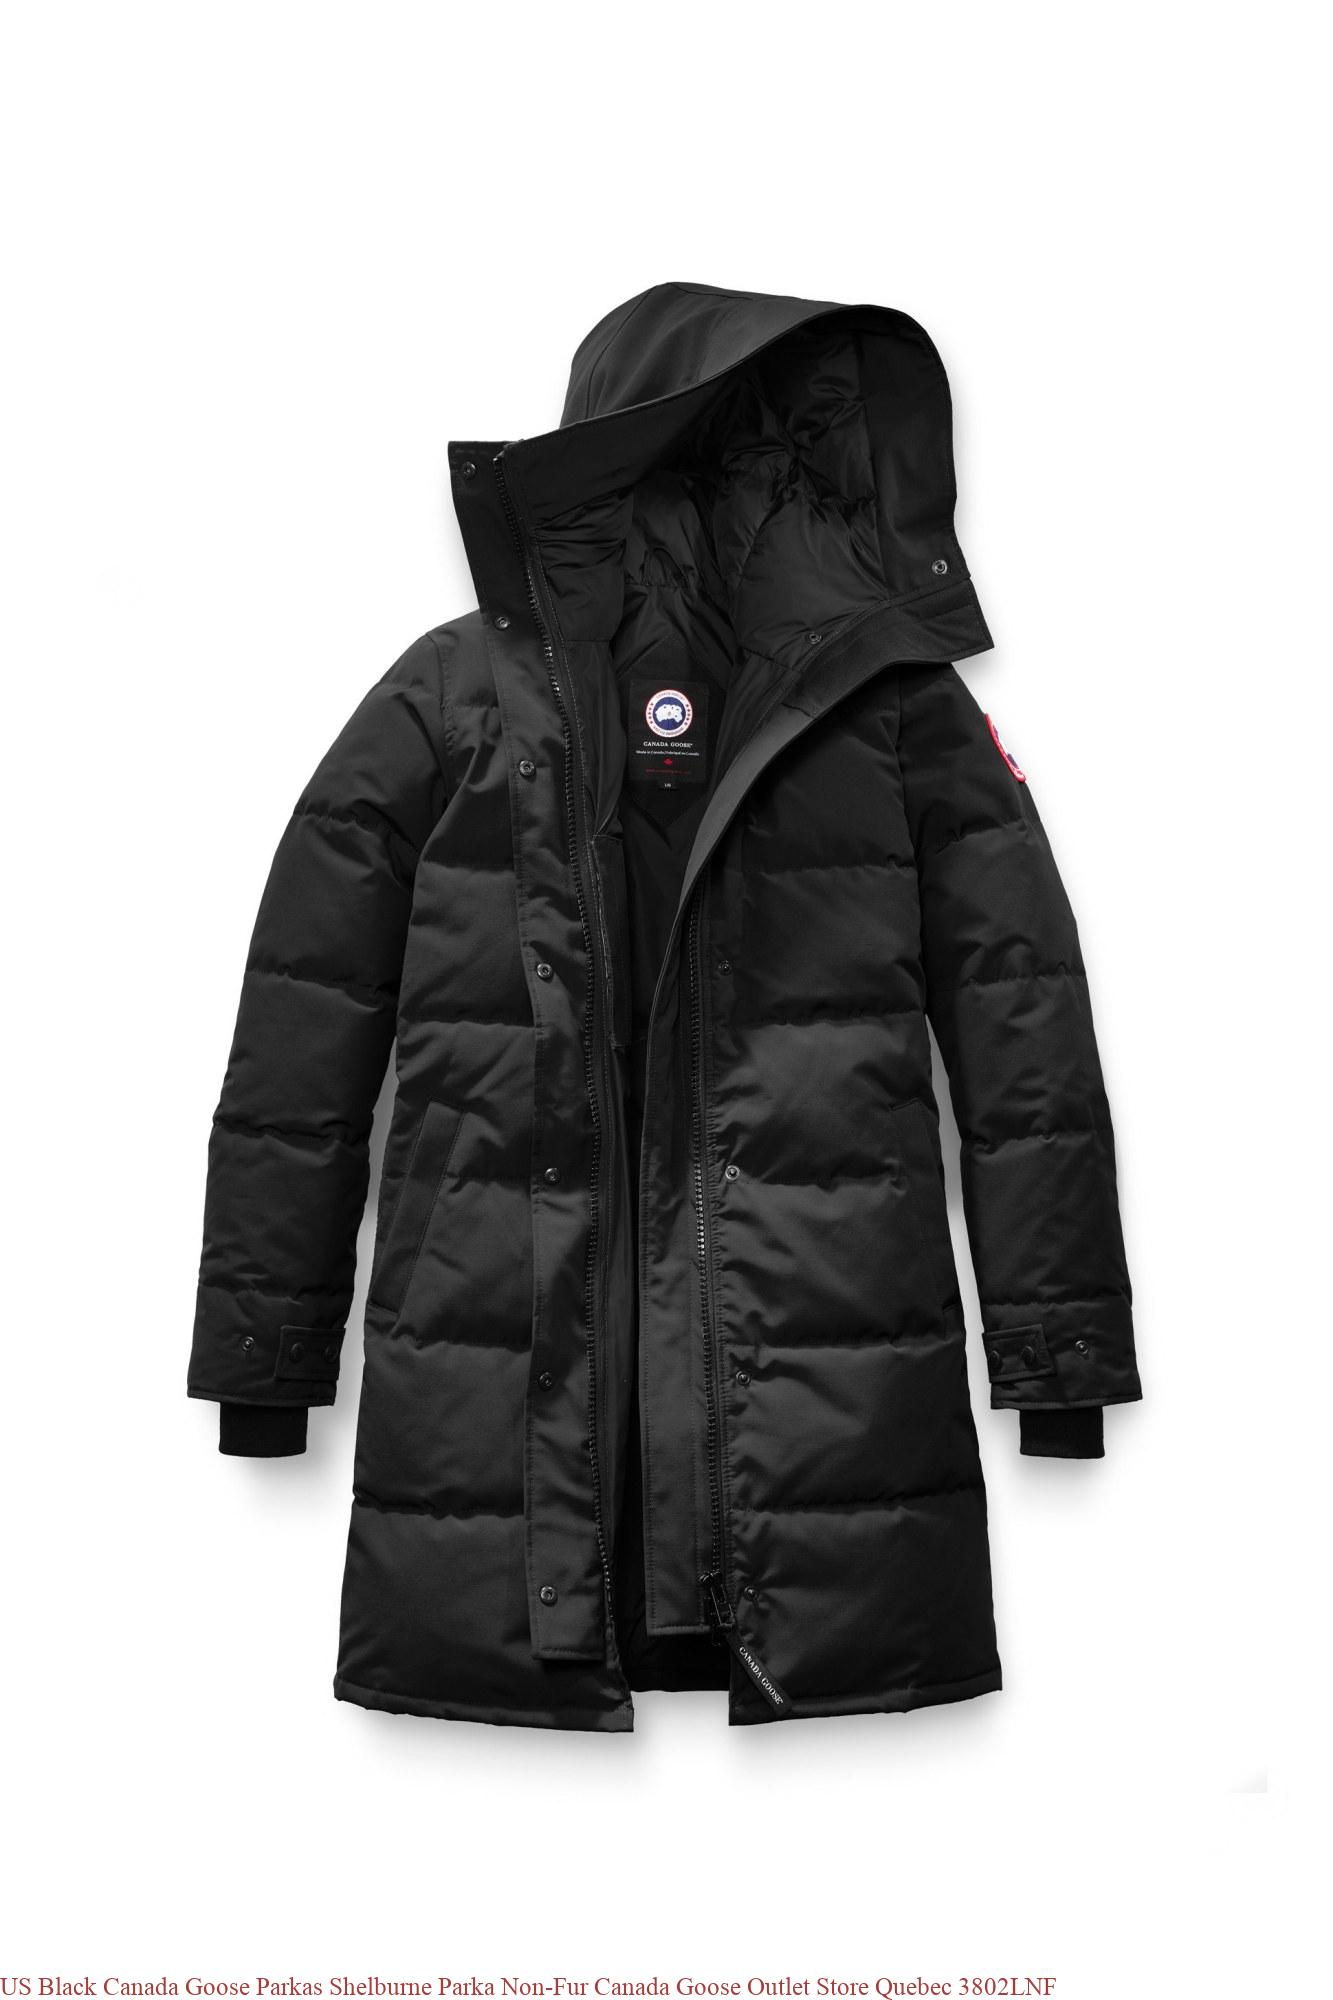 US Black Canada Goose Parkas Shelburne Parka Non-Fur Canada Goose Outlet  Store Quebec 3802LNF 31bd203b3